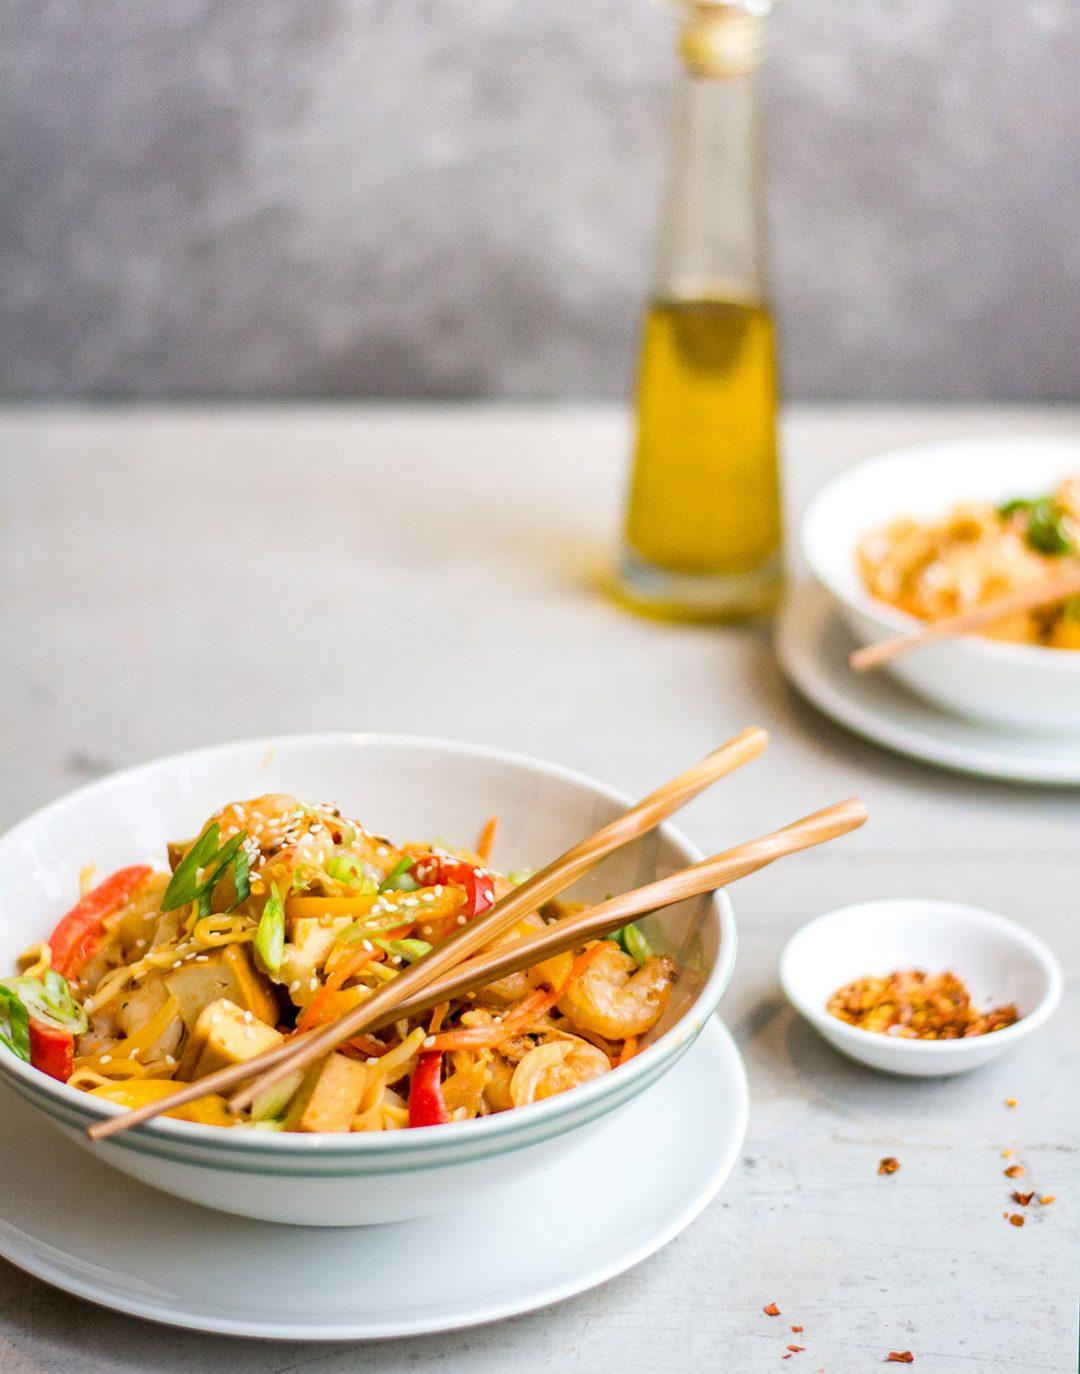 Pad thai in bowl with chopsticks